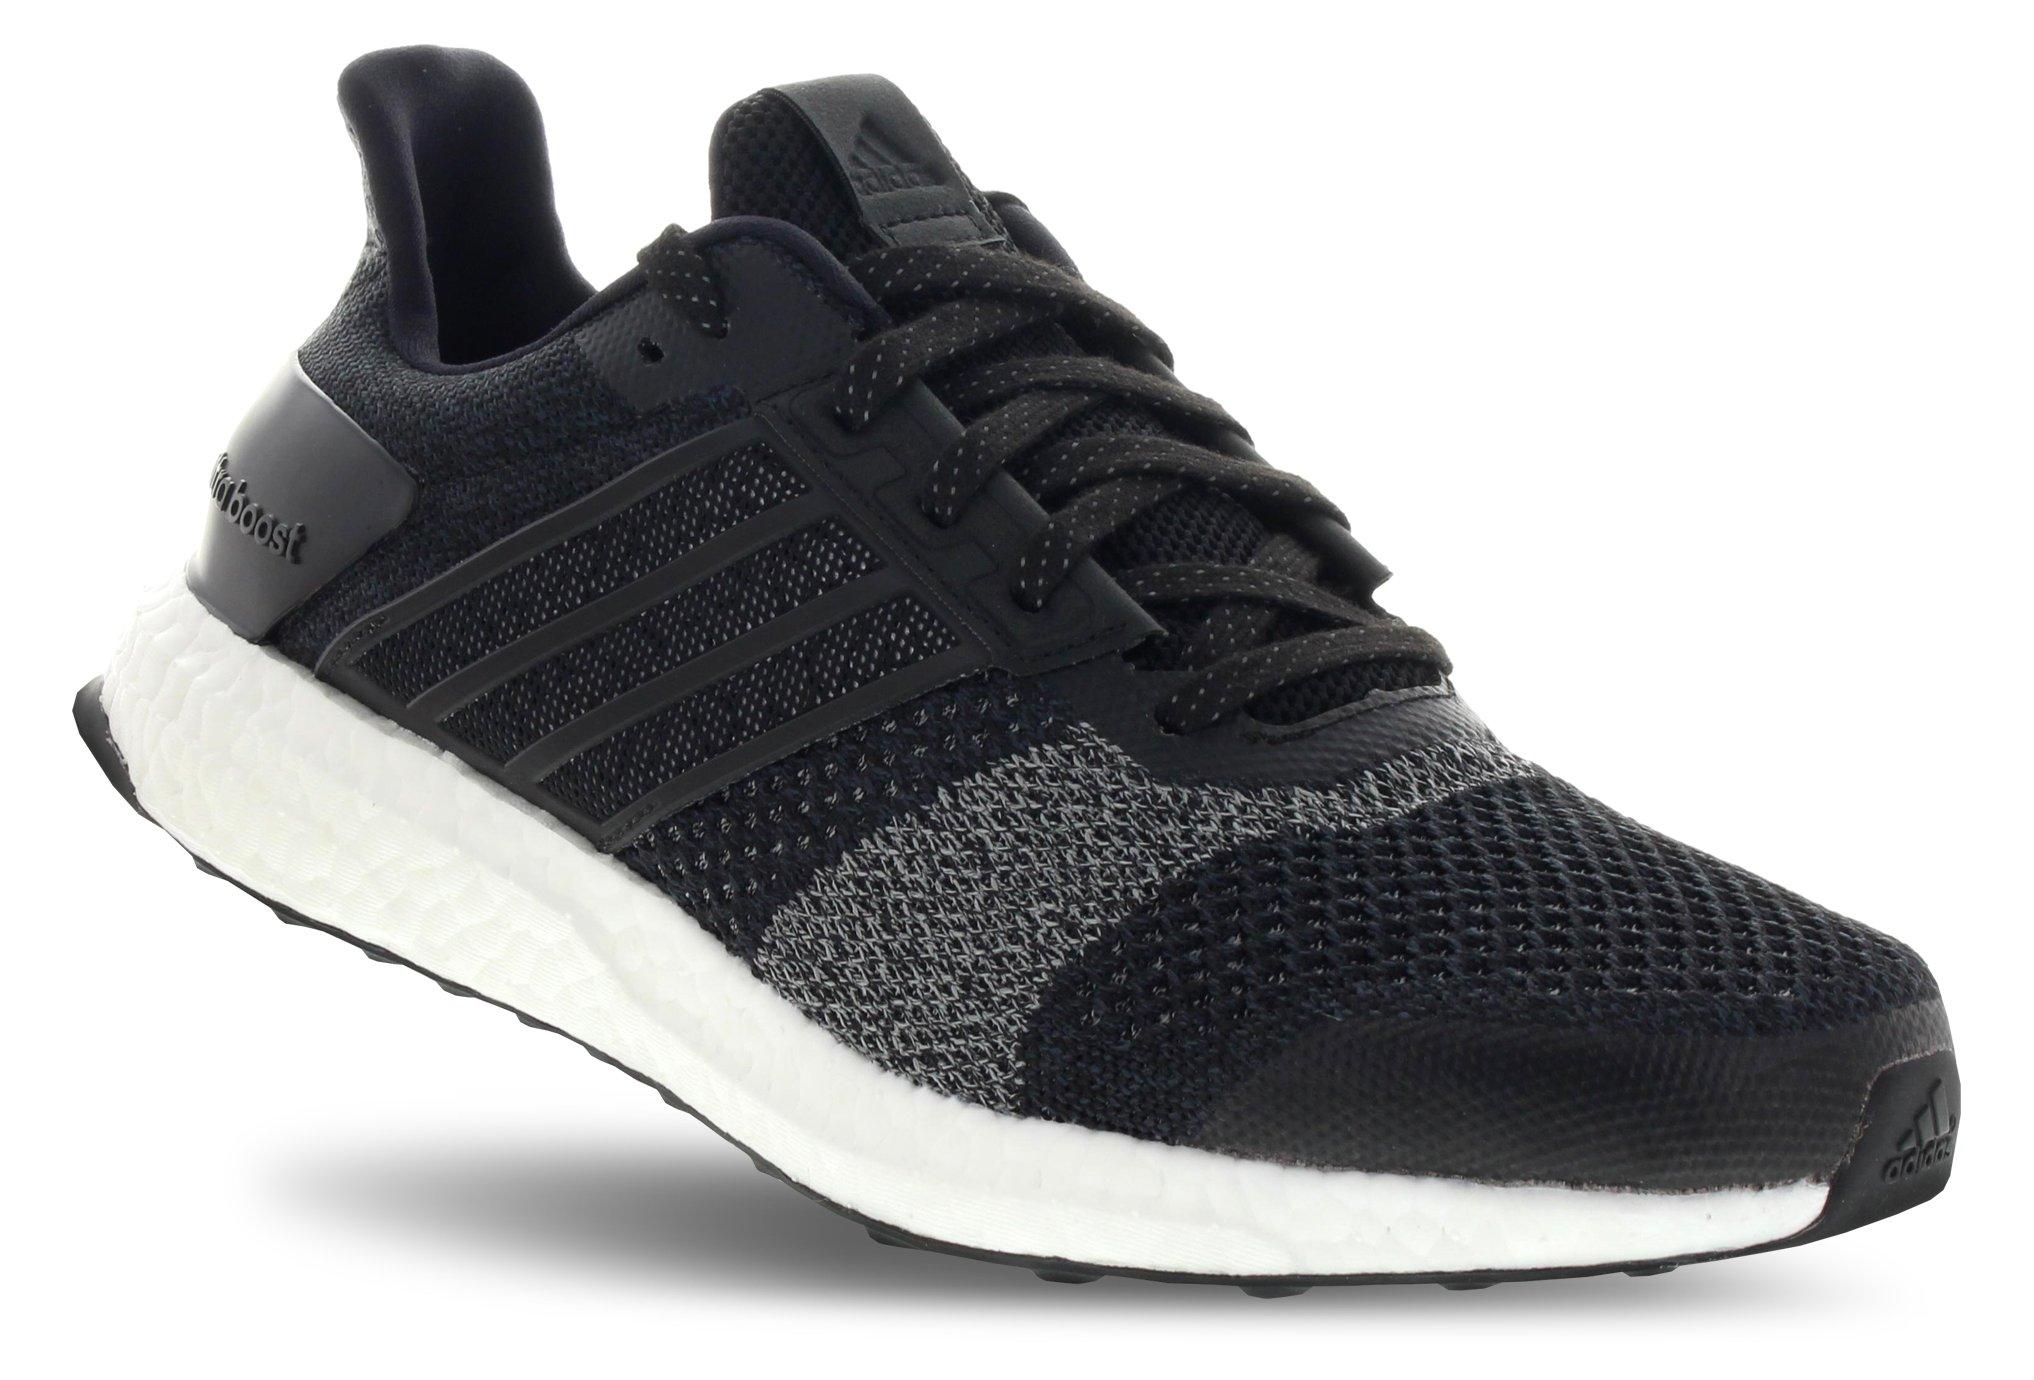 Adidas Ultraboost st glow w diététique chaussures femme